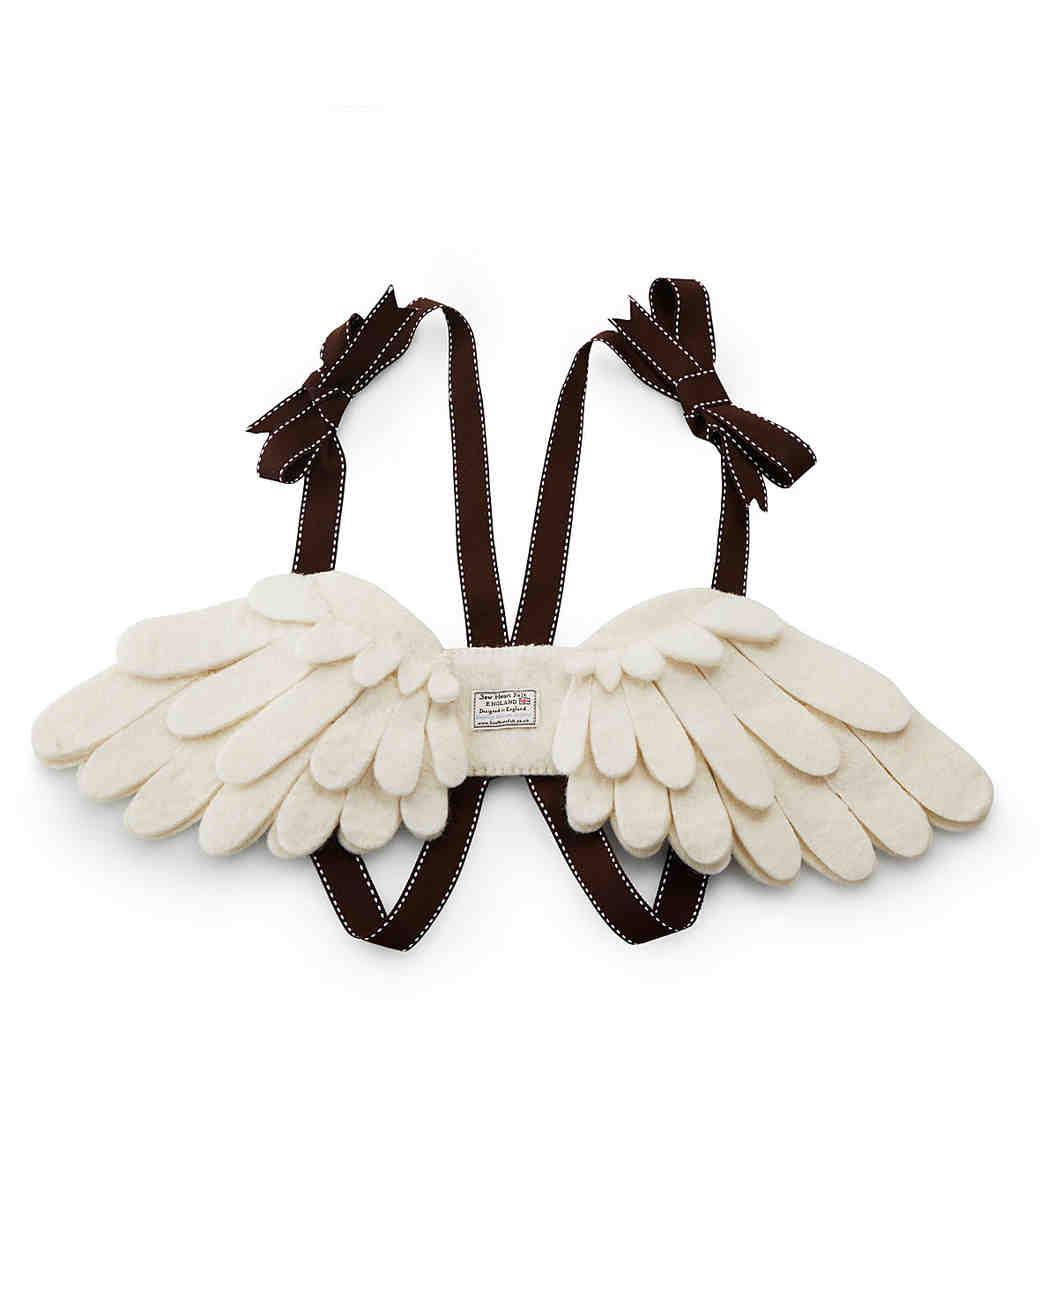 dress up wings